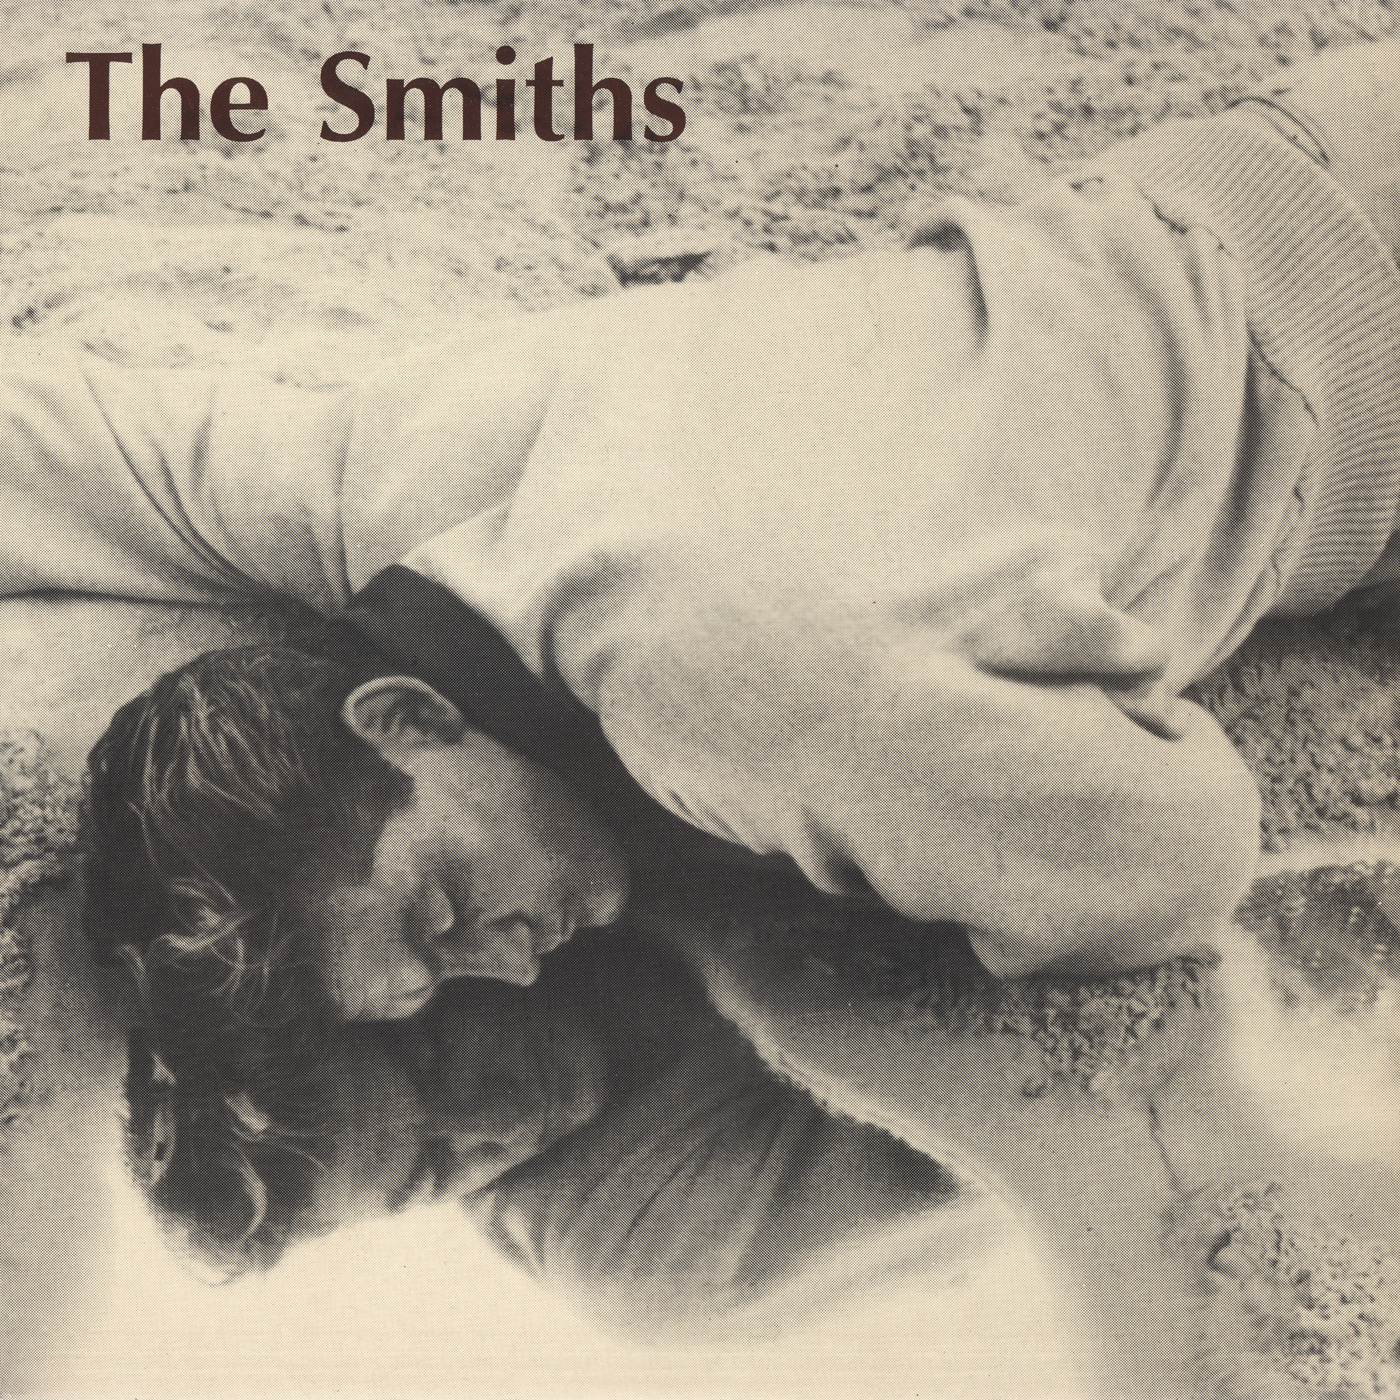 1983 - This Charming Man